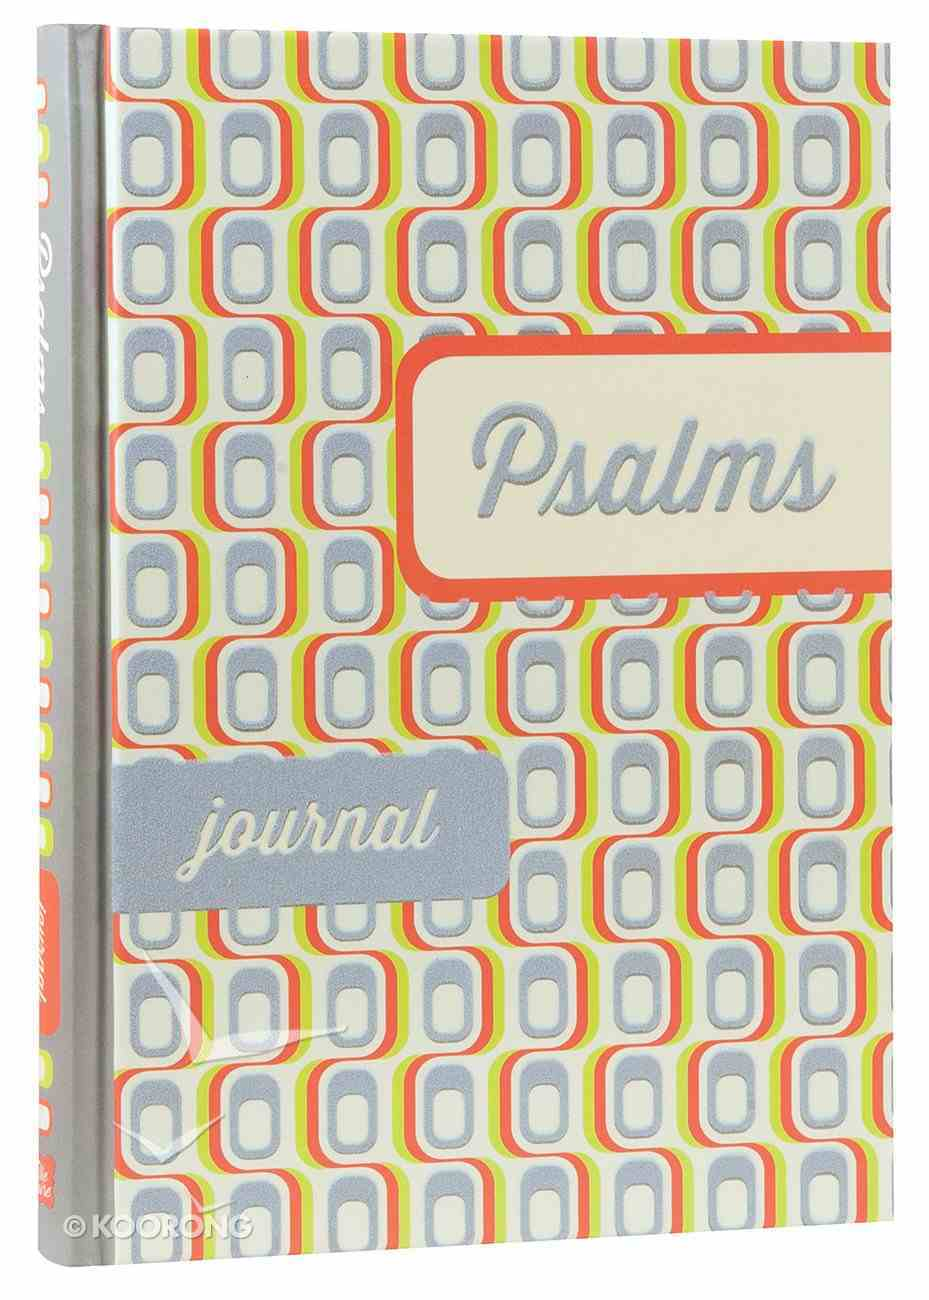 Elements Journal: Psalms Paperback